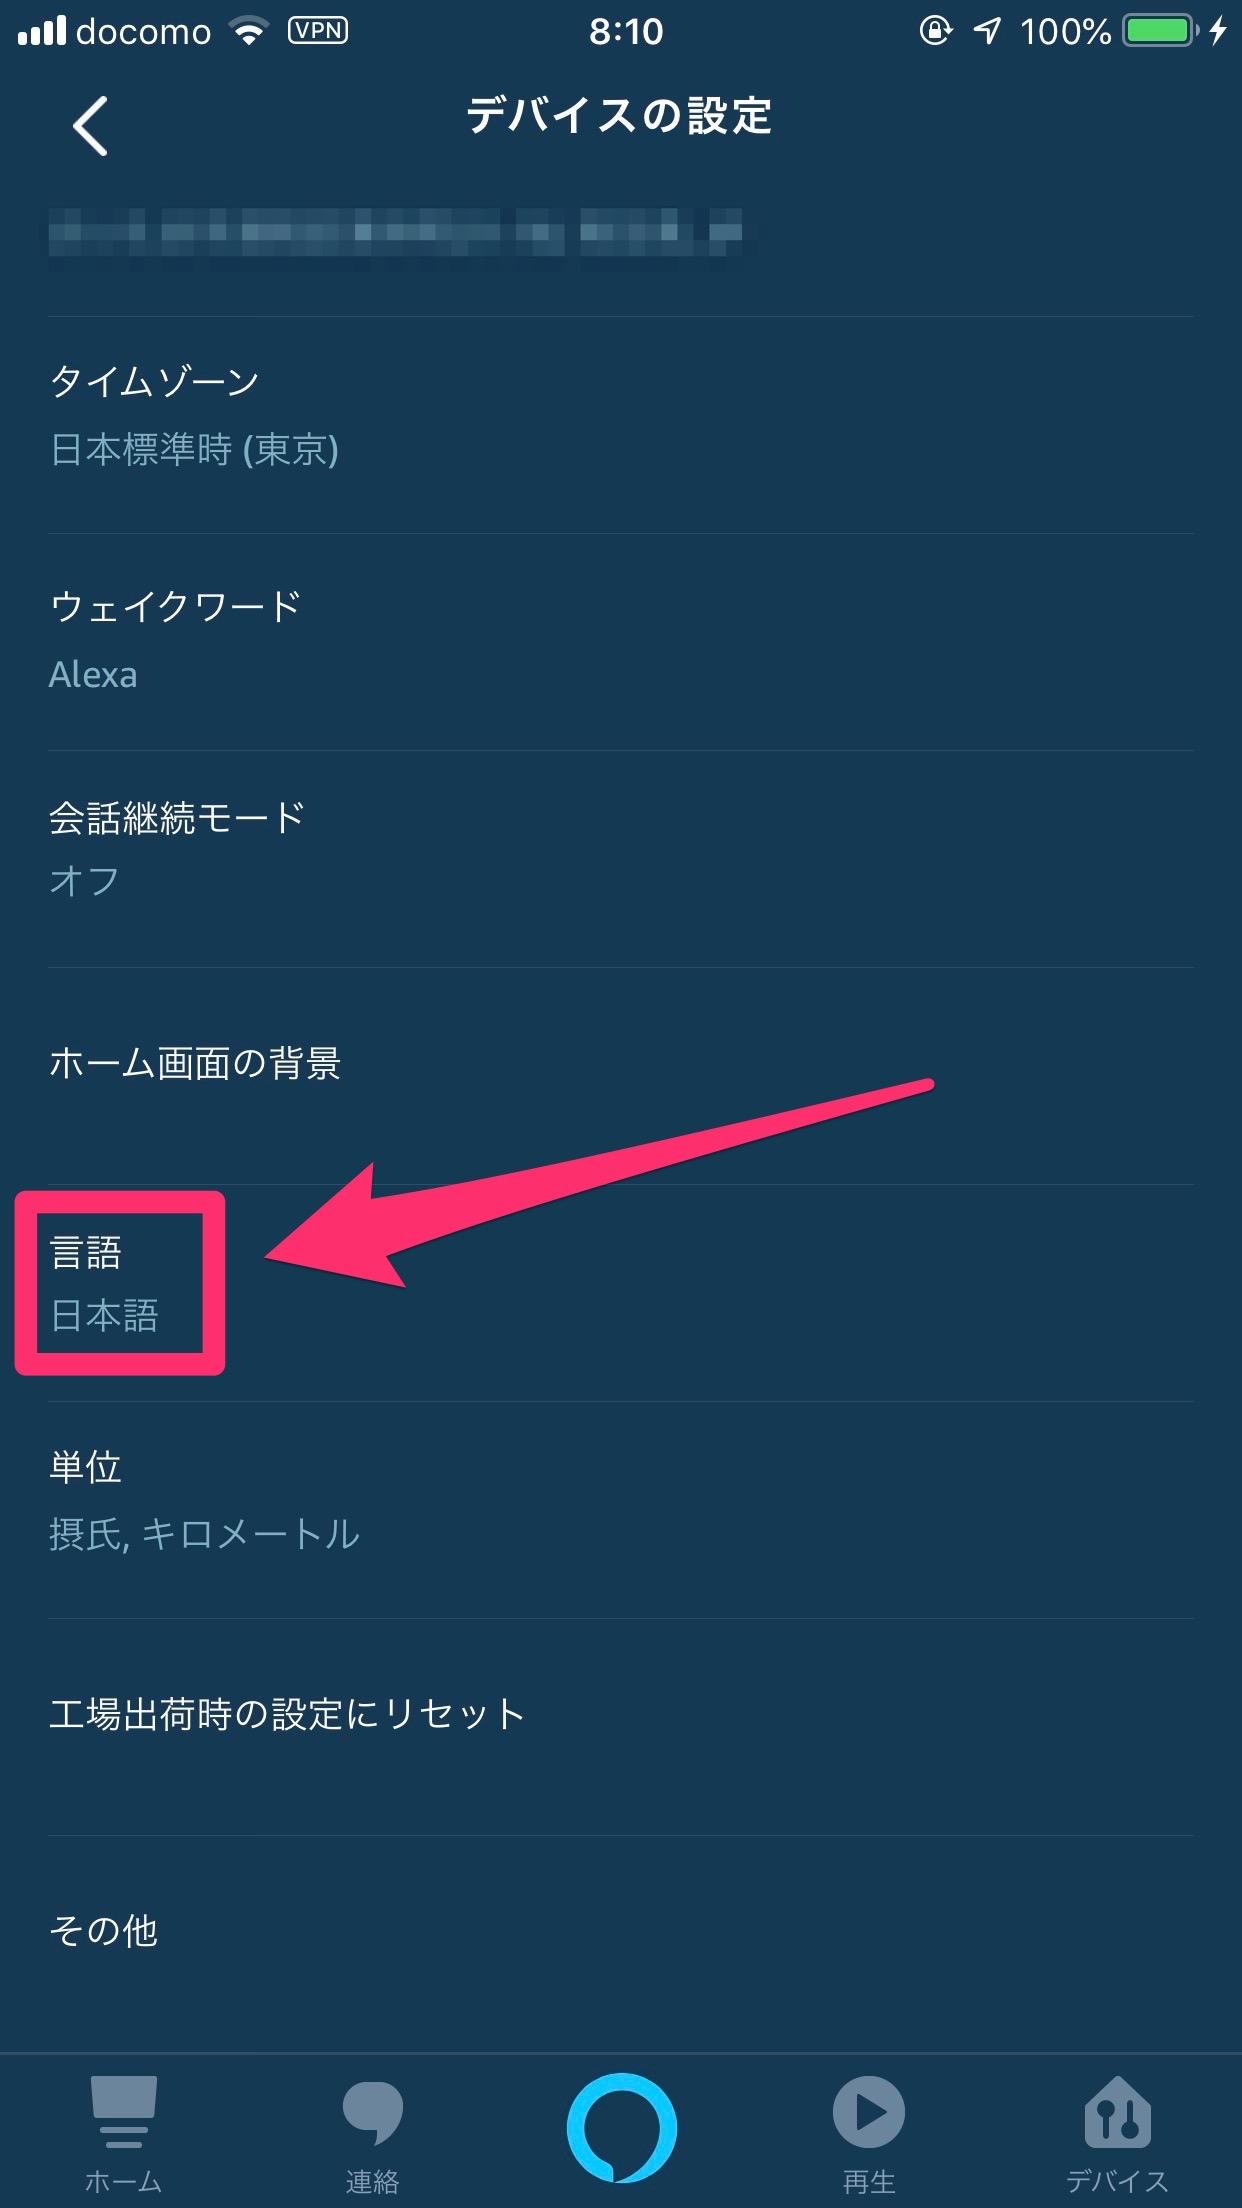 Amazon Alexaに英語で話しかけると日本語で回答する